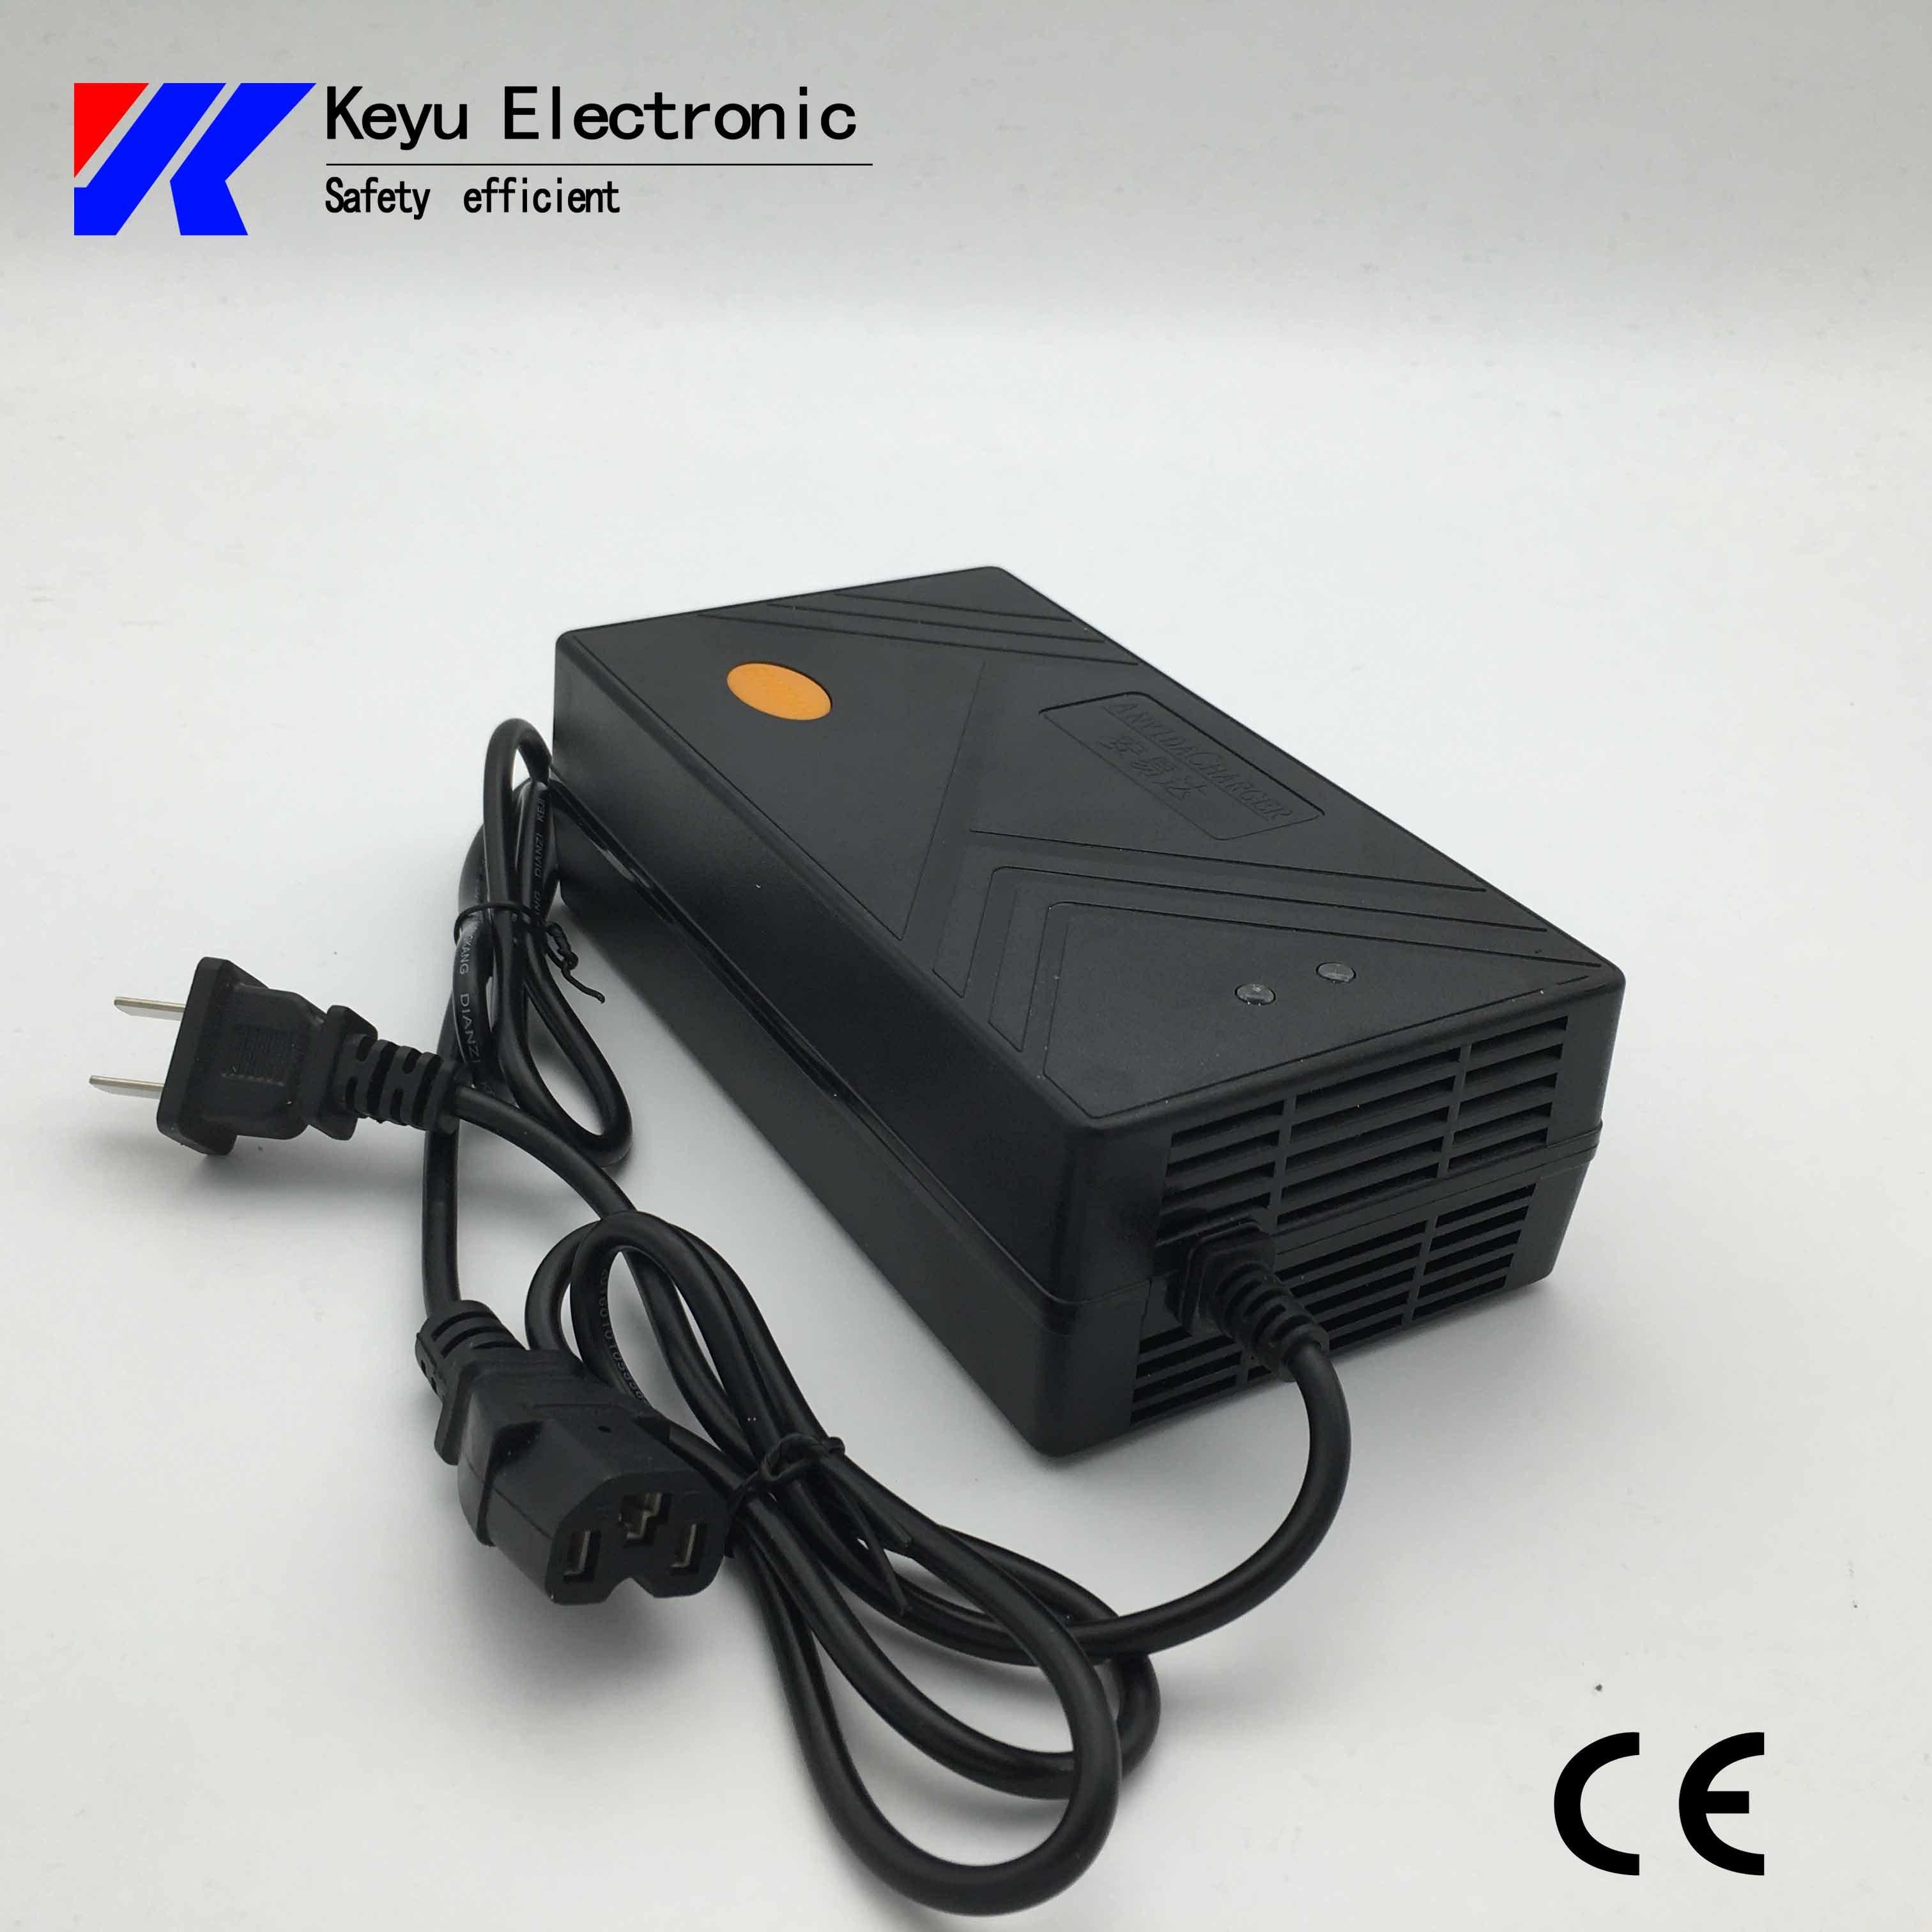 AN YI DA Ebike Charger60V-12ah (Lead Acid battery)